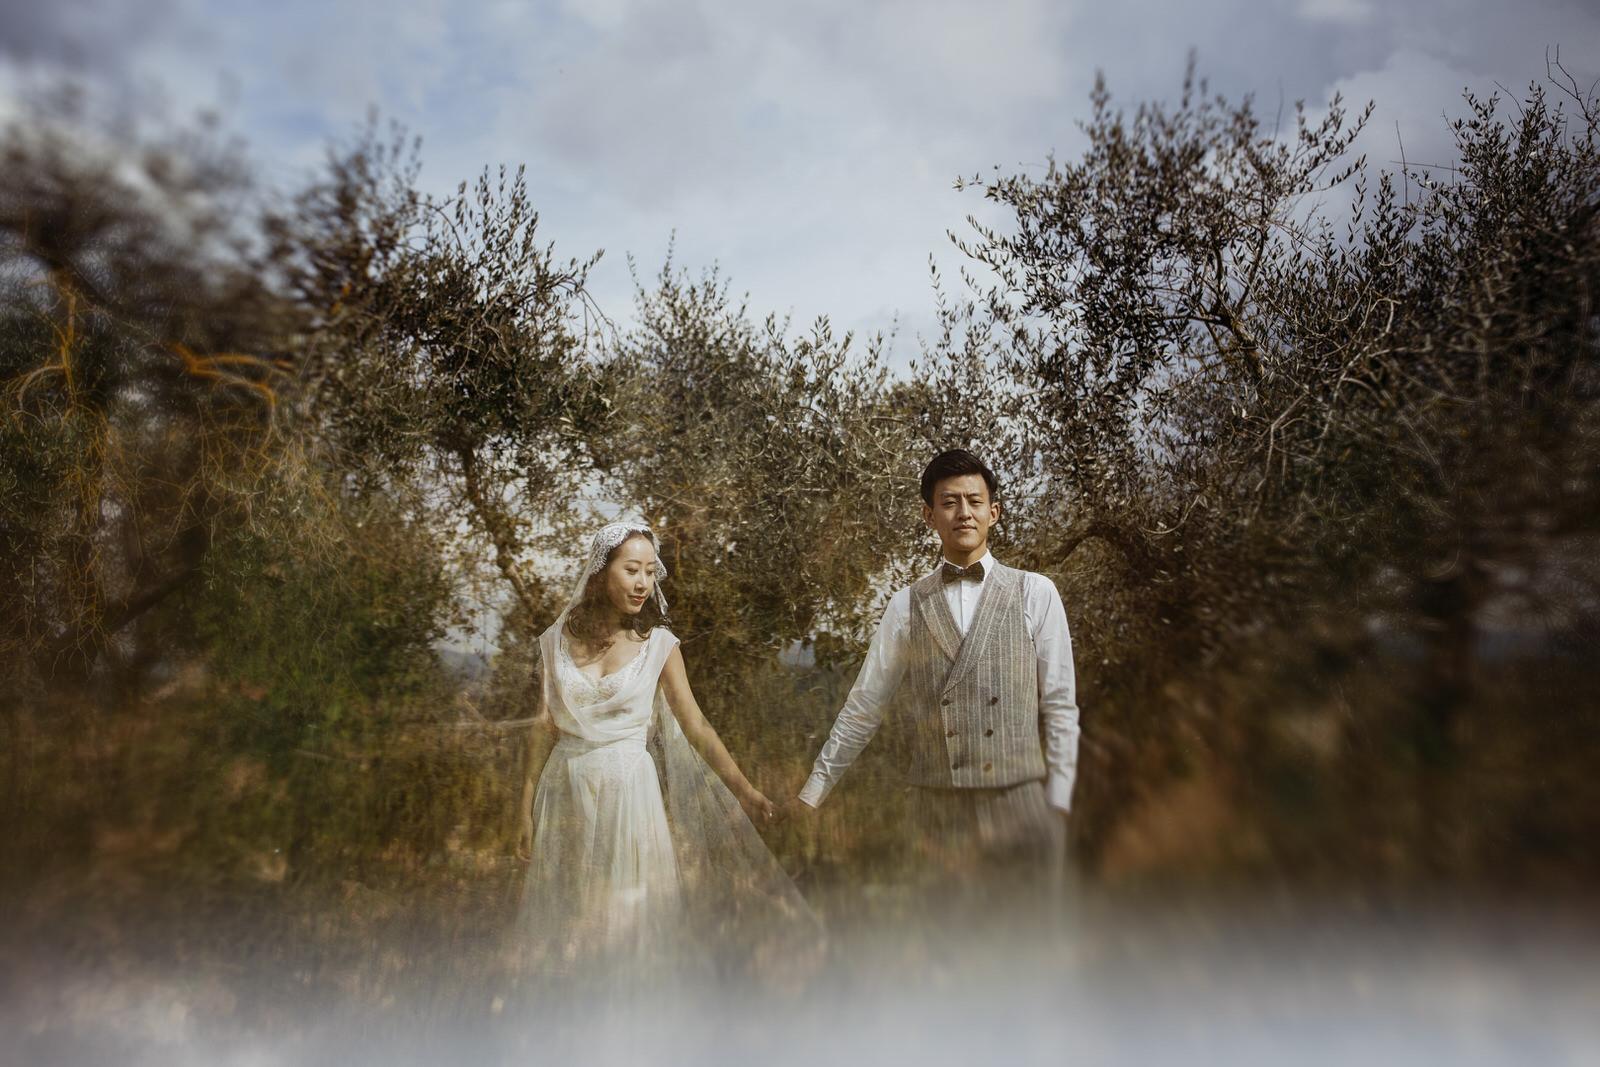 wedding photographer in italy-venice-tuscany-florence-amalfi coast-como lake-villa del balbianello-siena-amalfi-ravello-belmond-villa cimbrone56